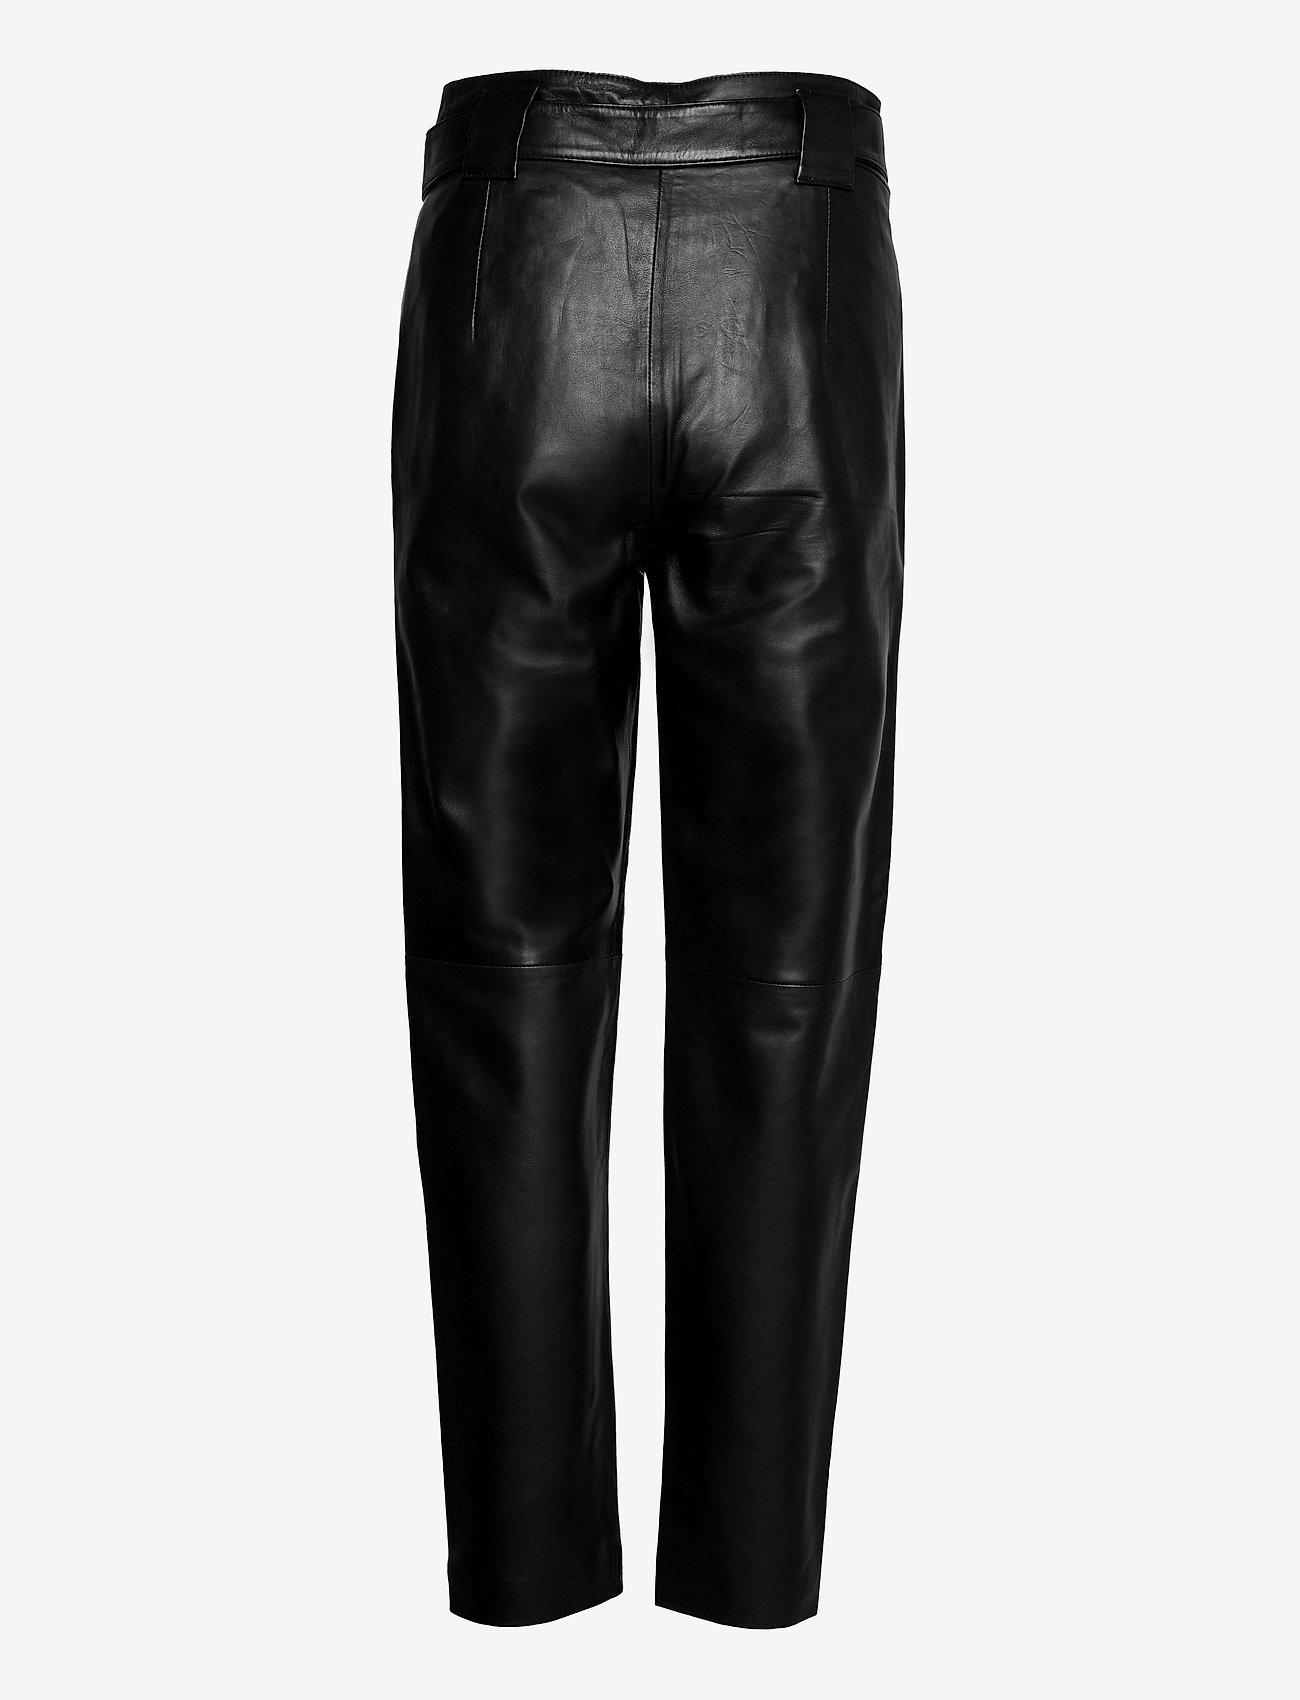 Just Female - Nago leather trousers - læderbukser - black - 1